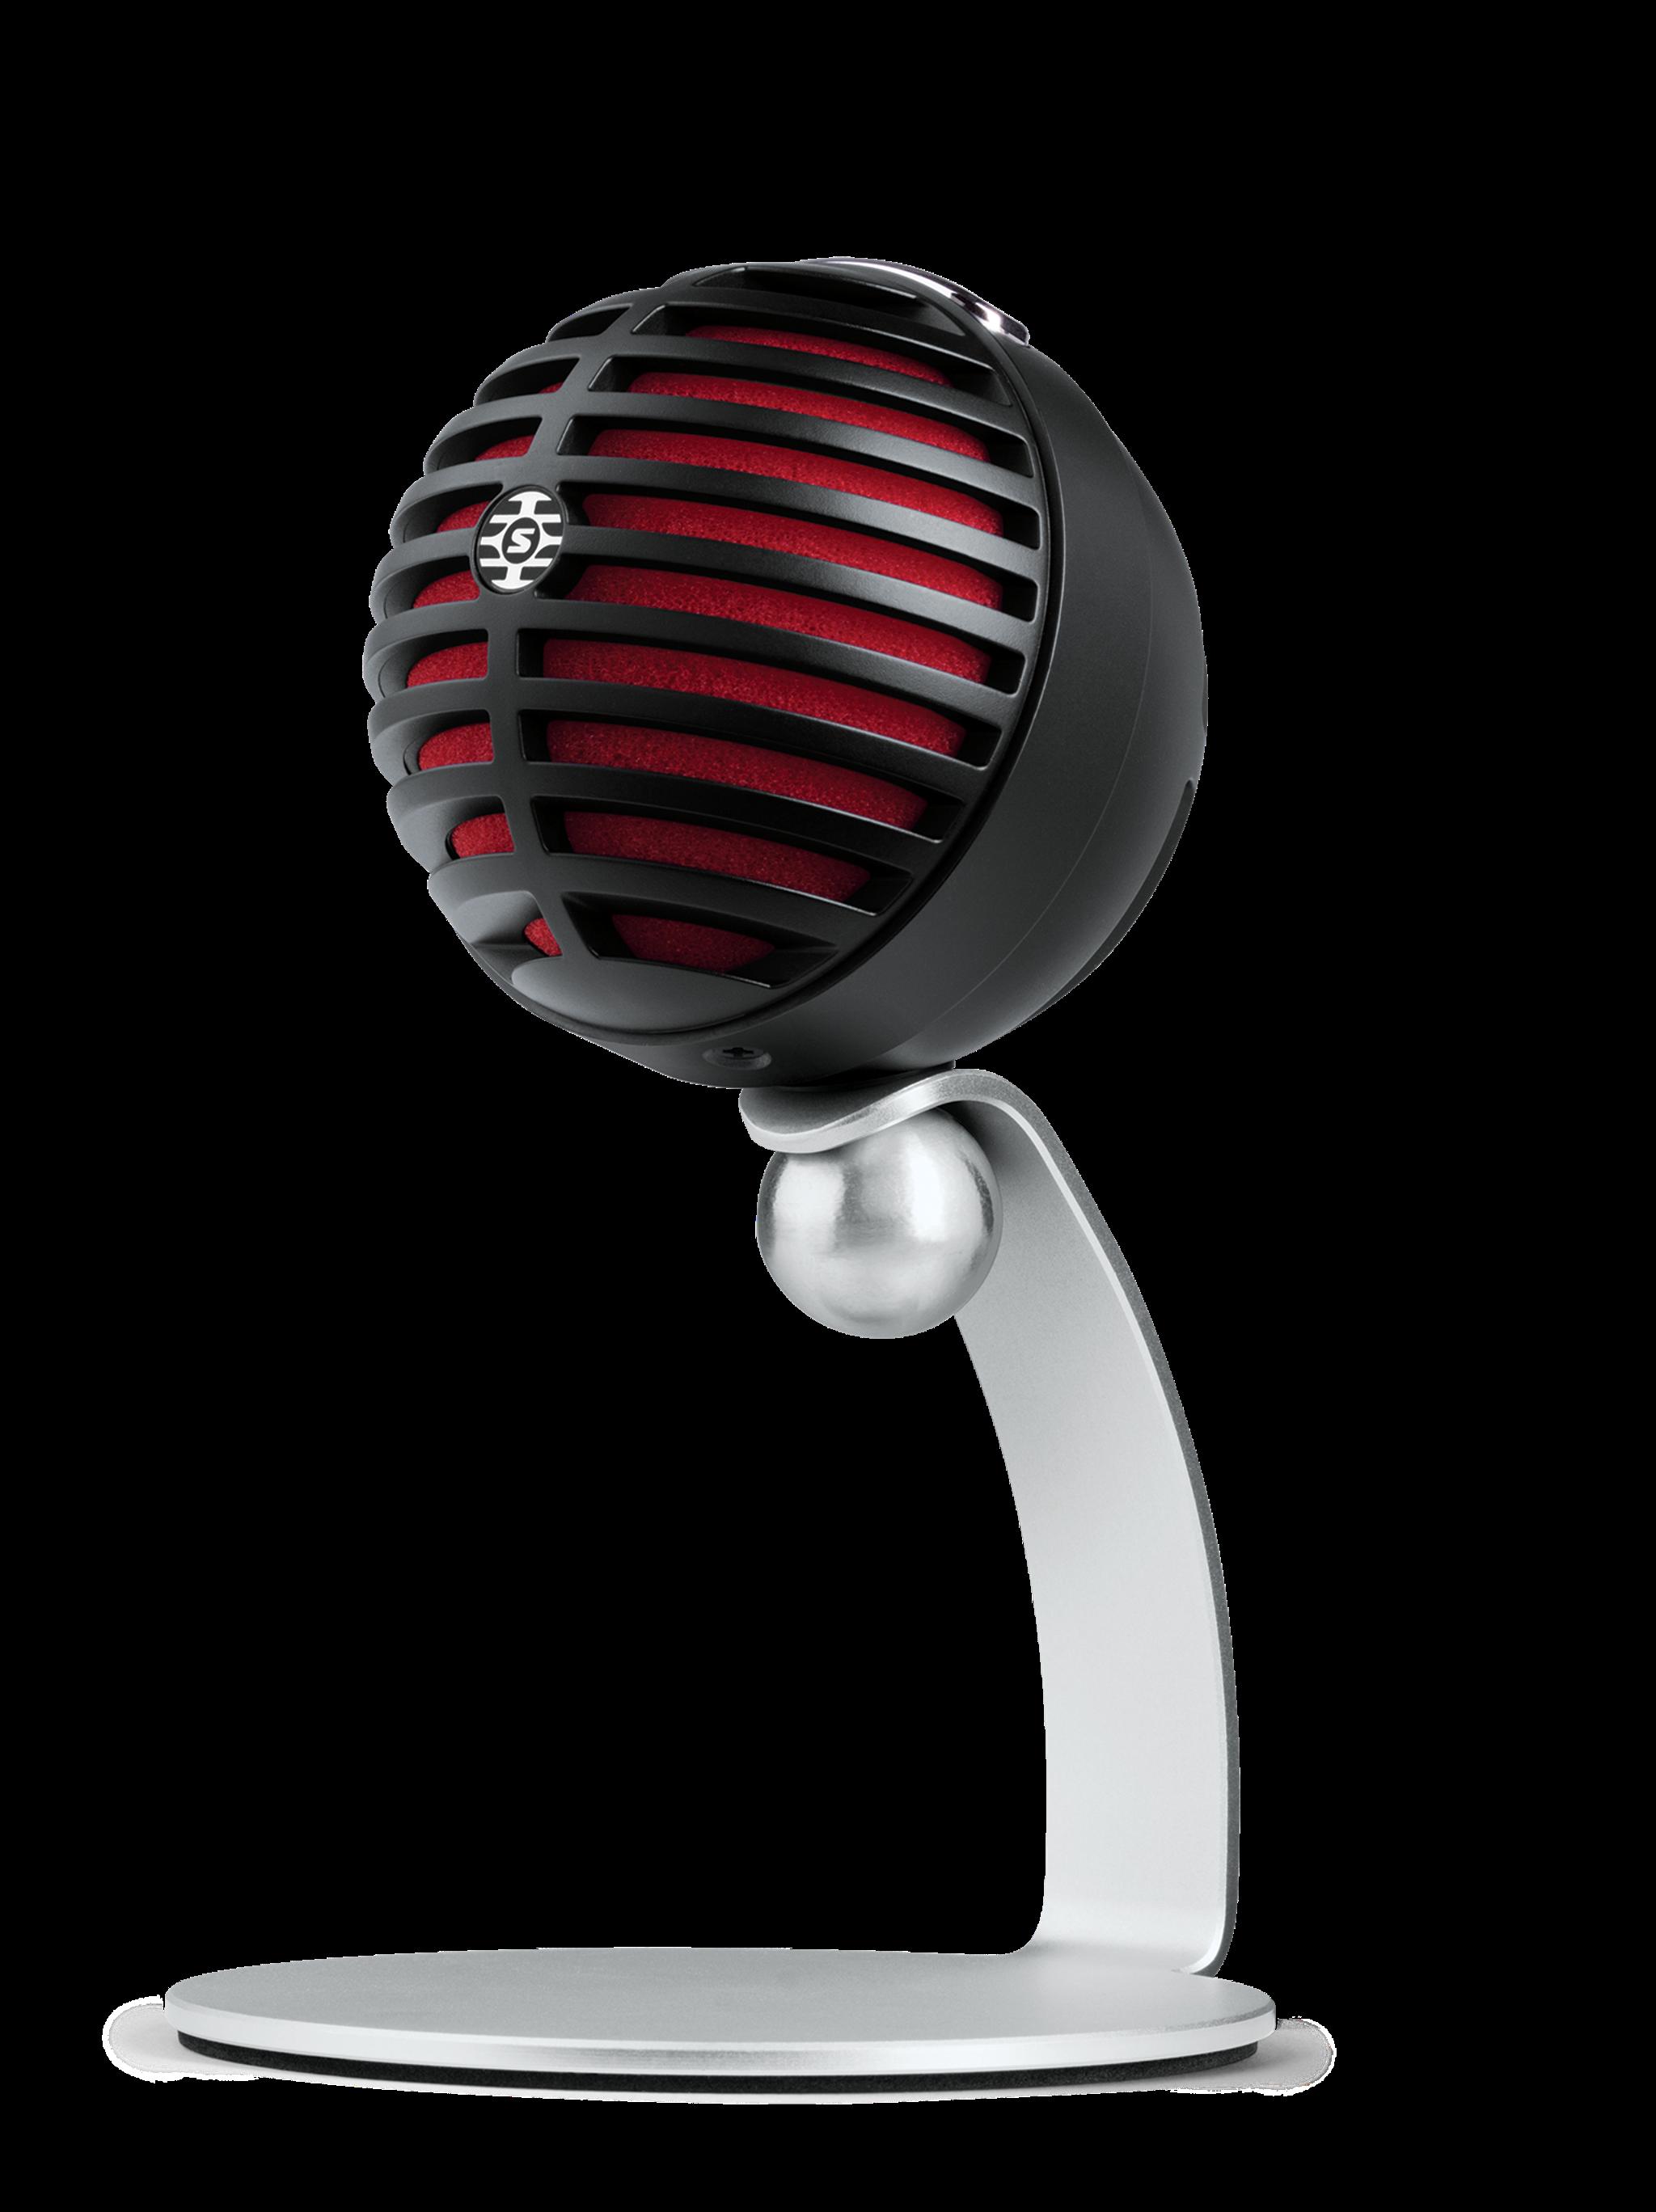 Shure MV5-A-B-LTG Digital condenser microphone black